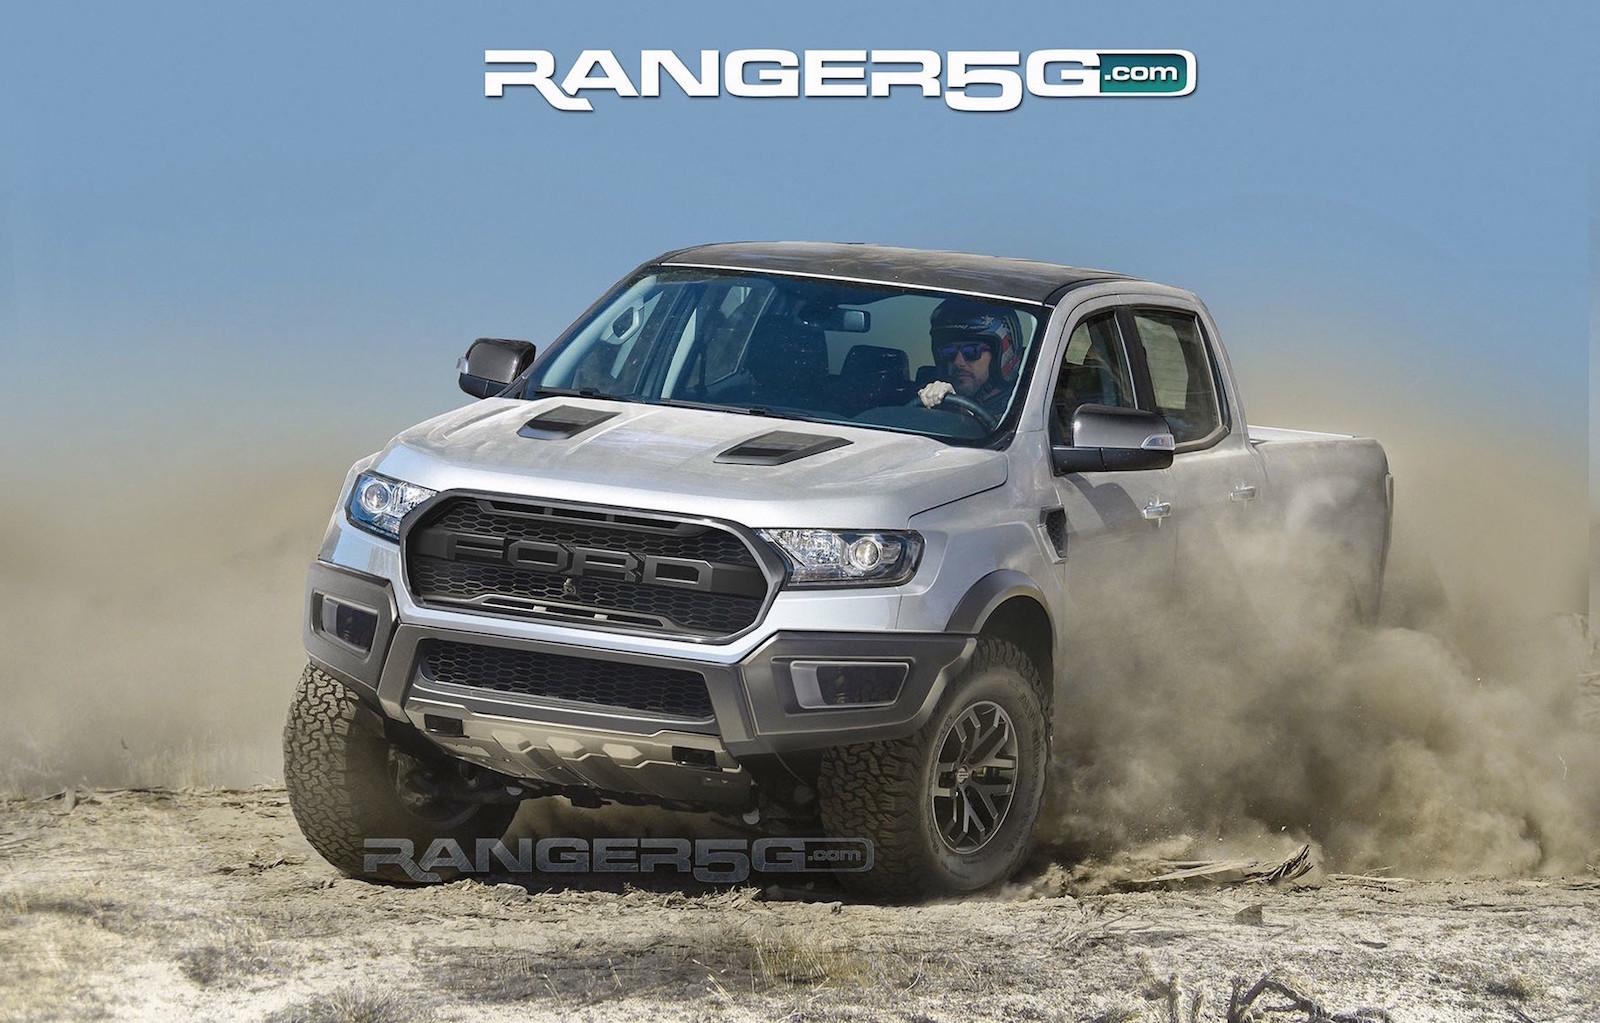 Ford Ranger Raptor Rendered Based On Official Prototype